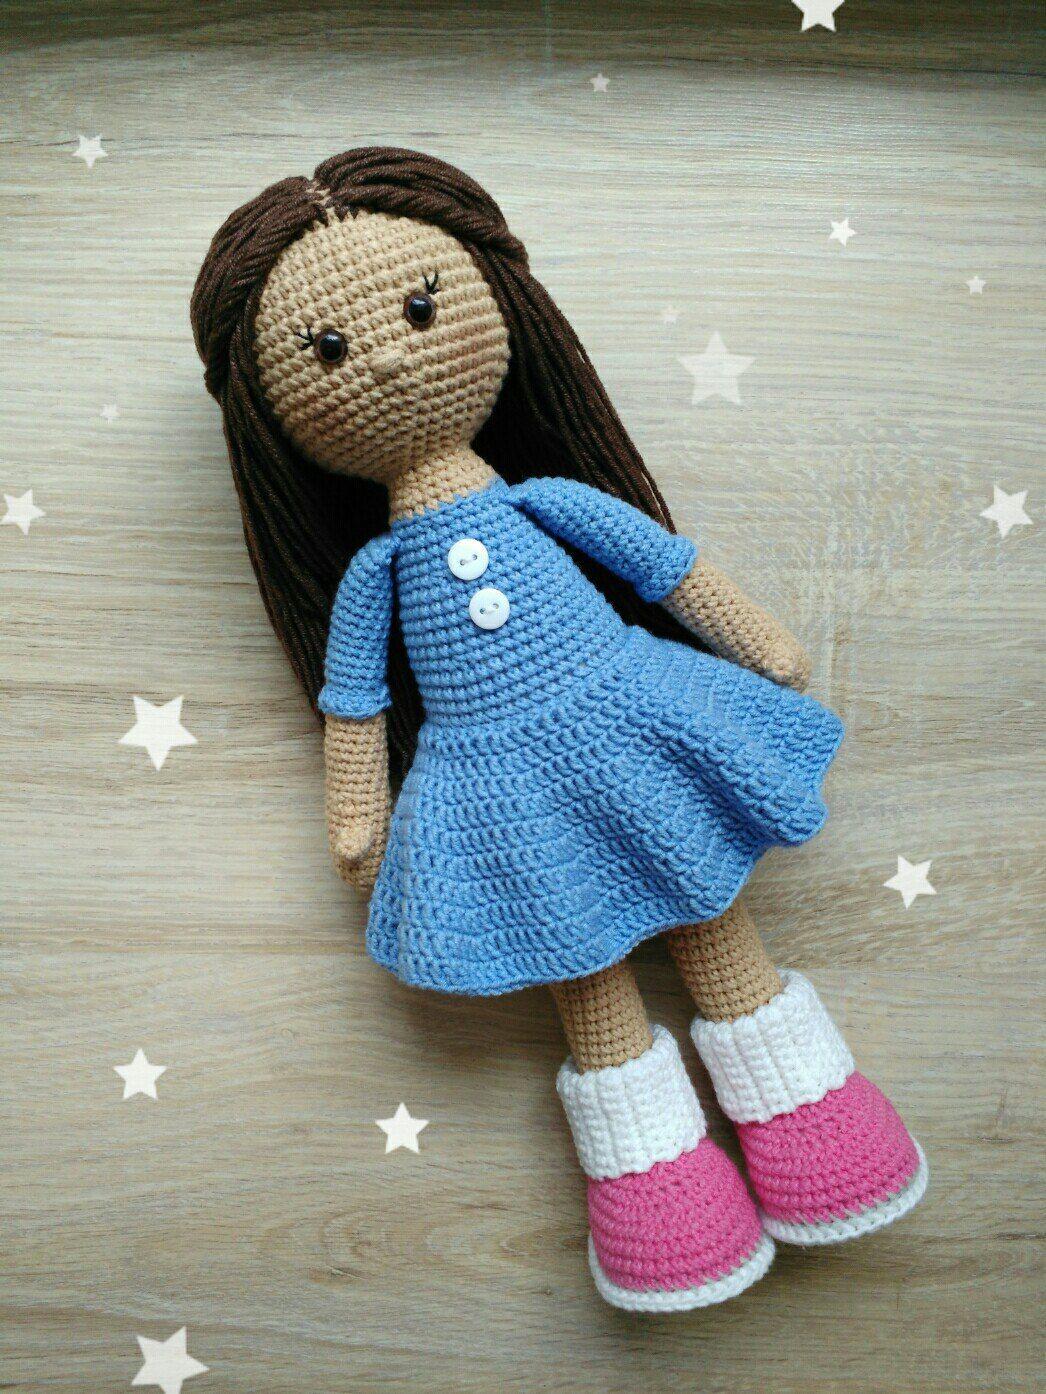 Molly doll crochet pattern #crochetamigurumifreepatterns